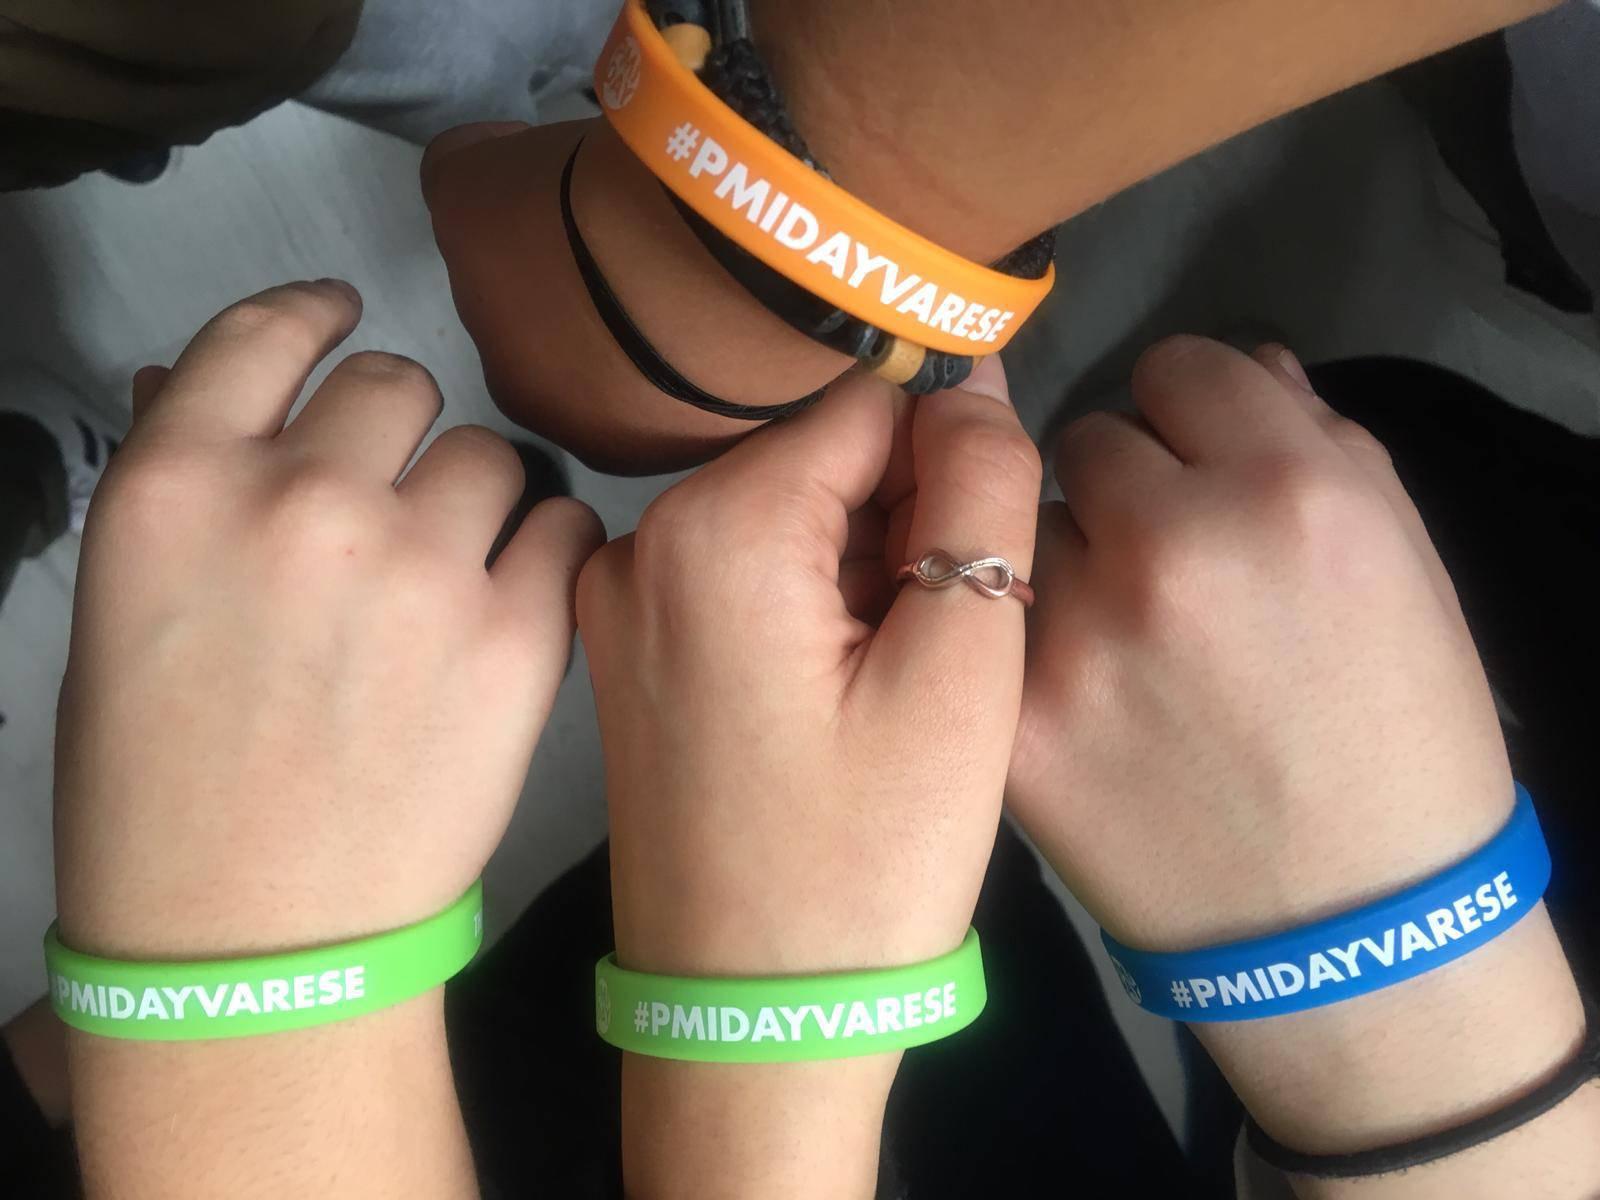 Ragazzi coi braccialetti Amca Elevatori